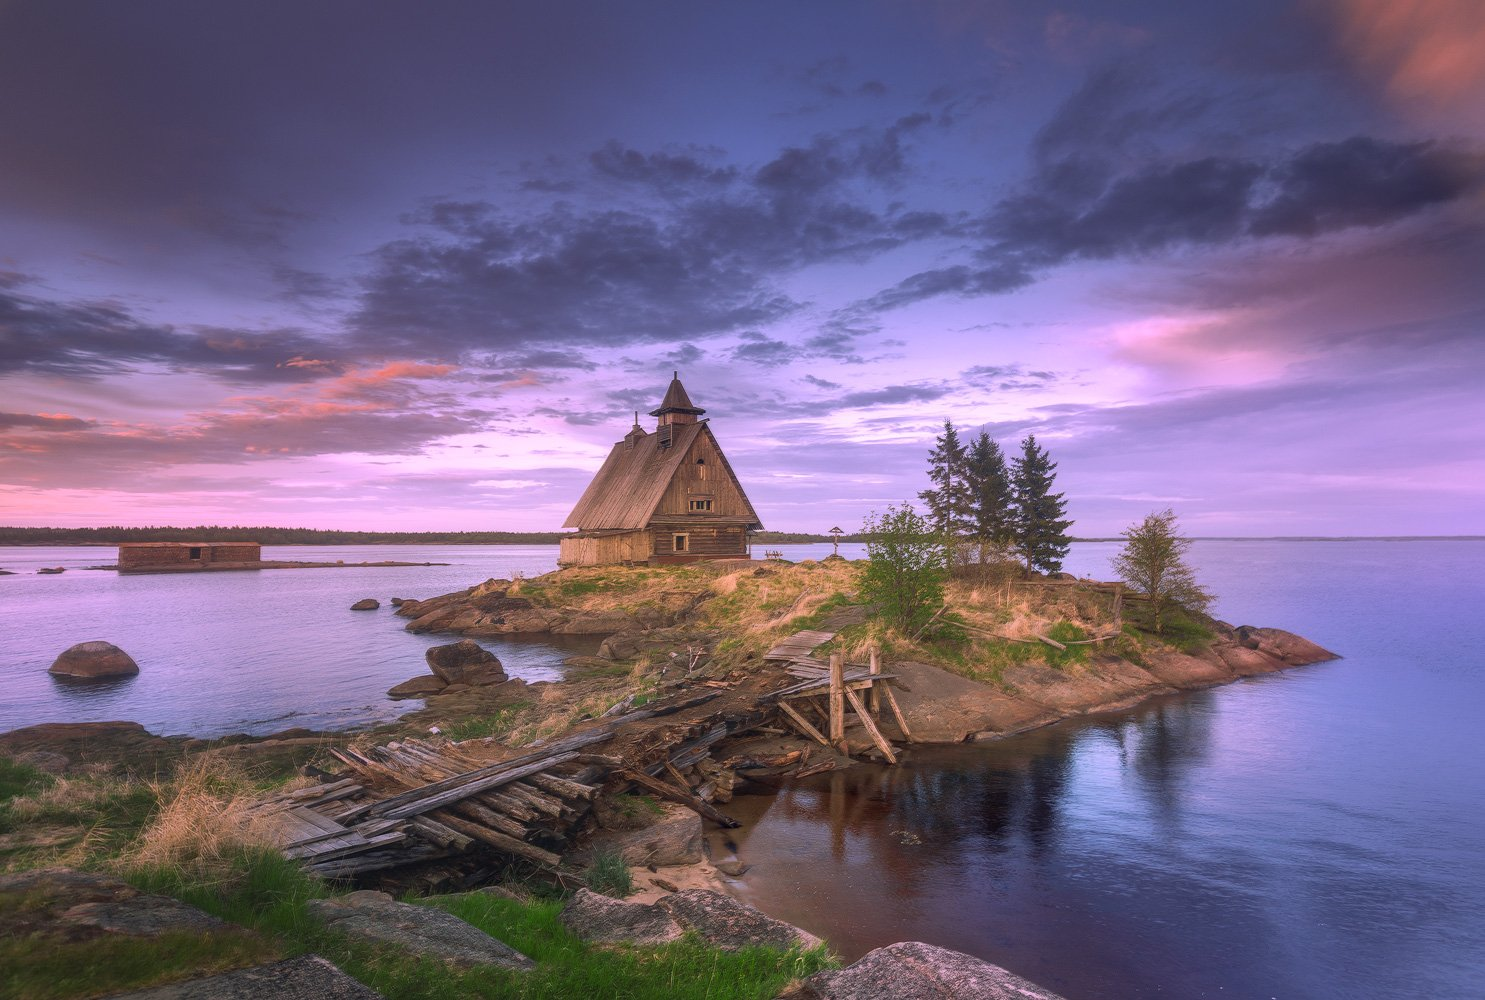 Россия, север, пейзаж, закат, море, Mikhail vorobyev